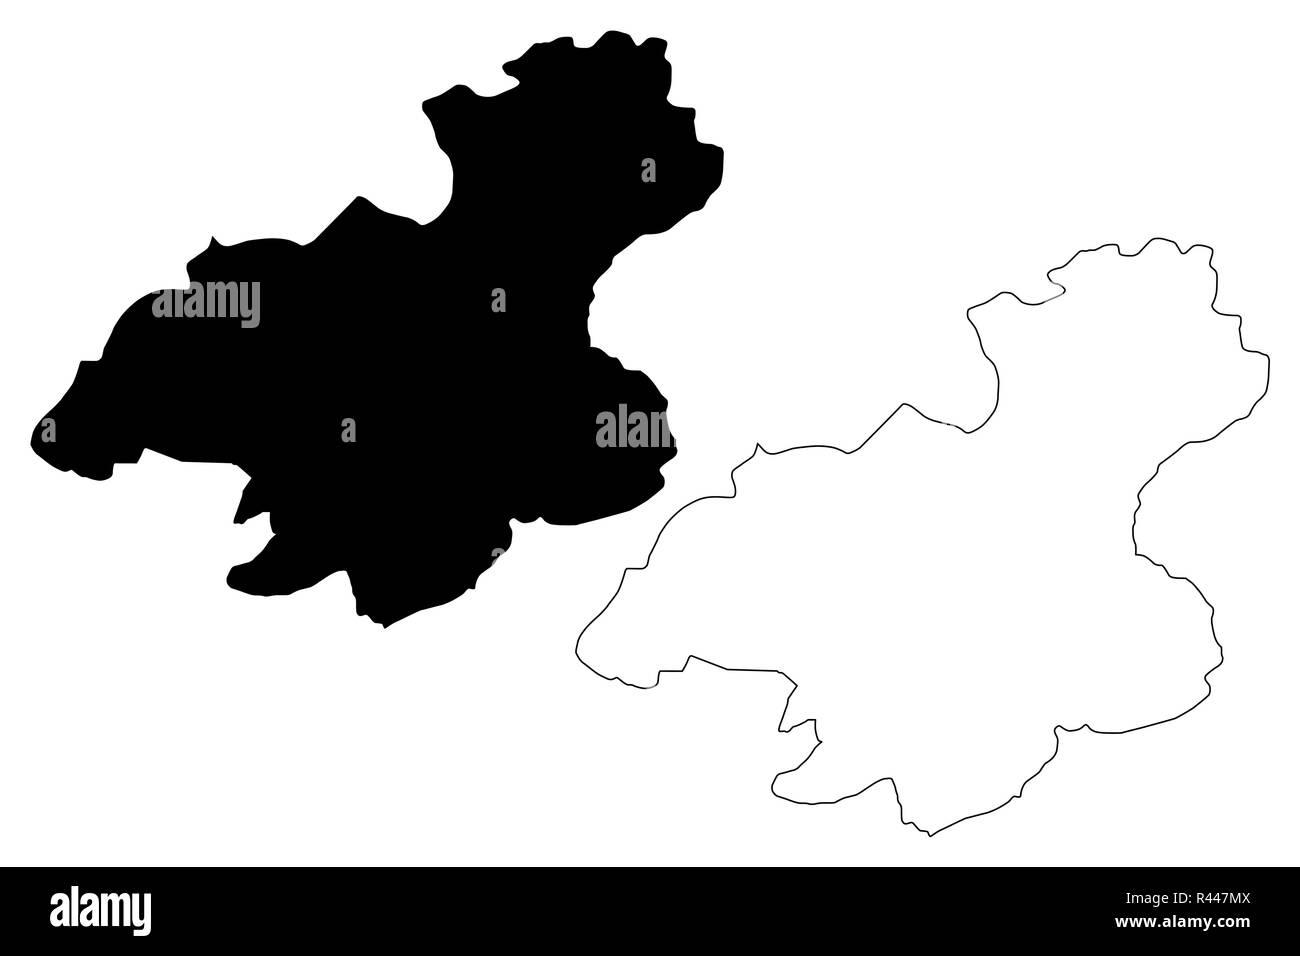 Karabuk (Provinces of the Republic of Turkey) map vector illustration, scribble sketch Karabük ili map - Stock Image